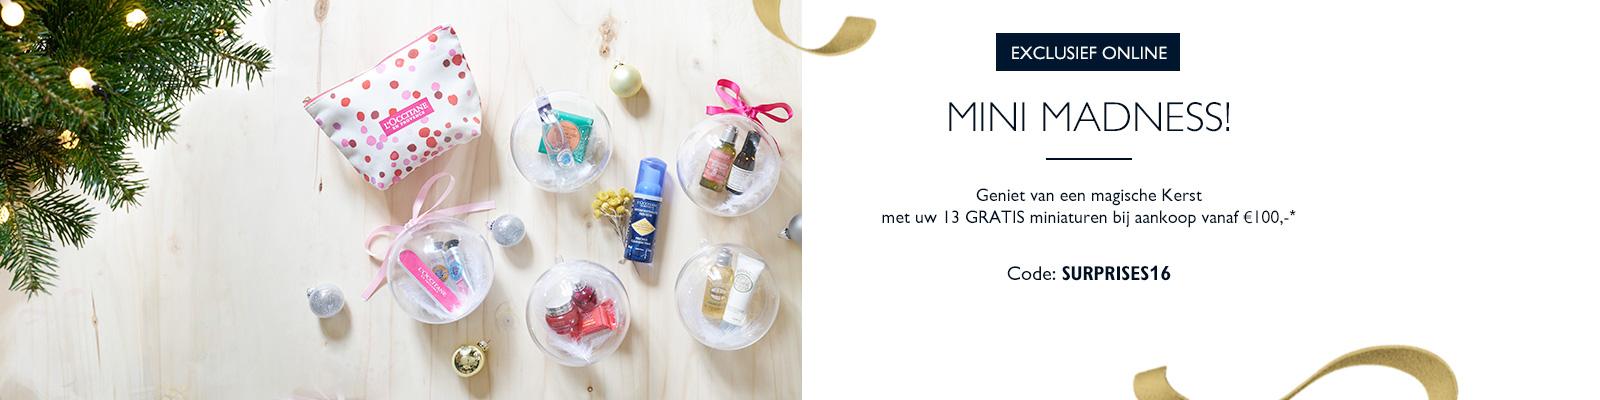 Offre miniatures - L'Occitane